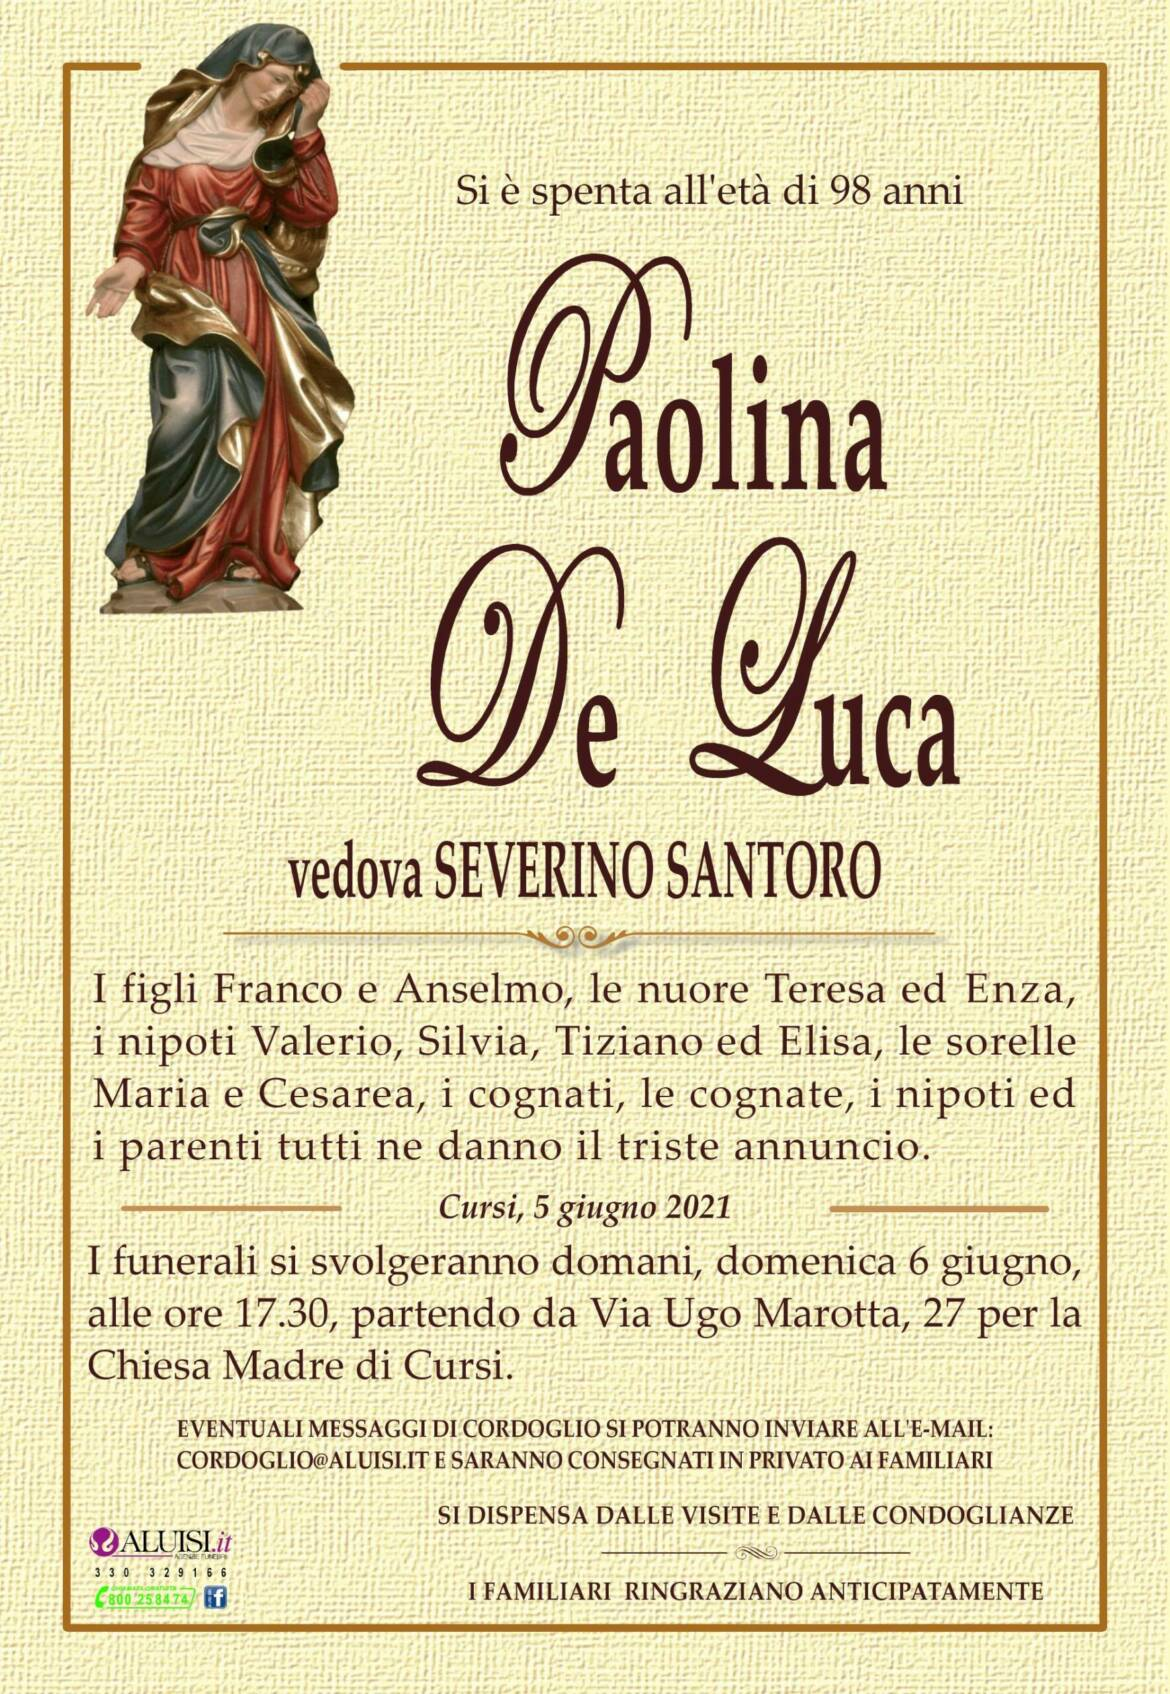 Annuncio-PAOLINA-DE-LUCA-CURSI-scaled.jpg